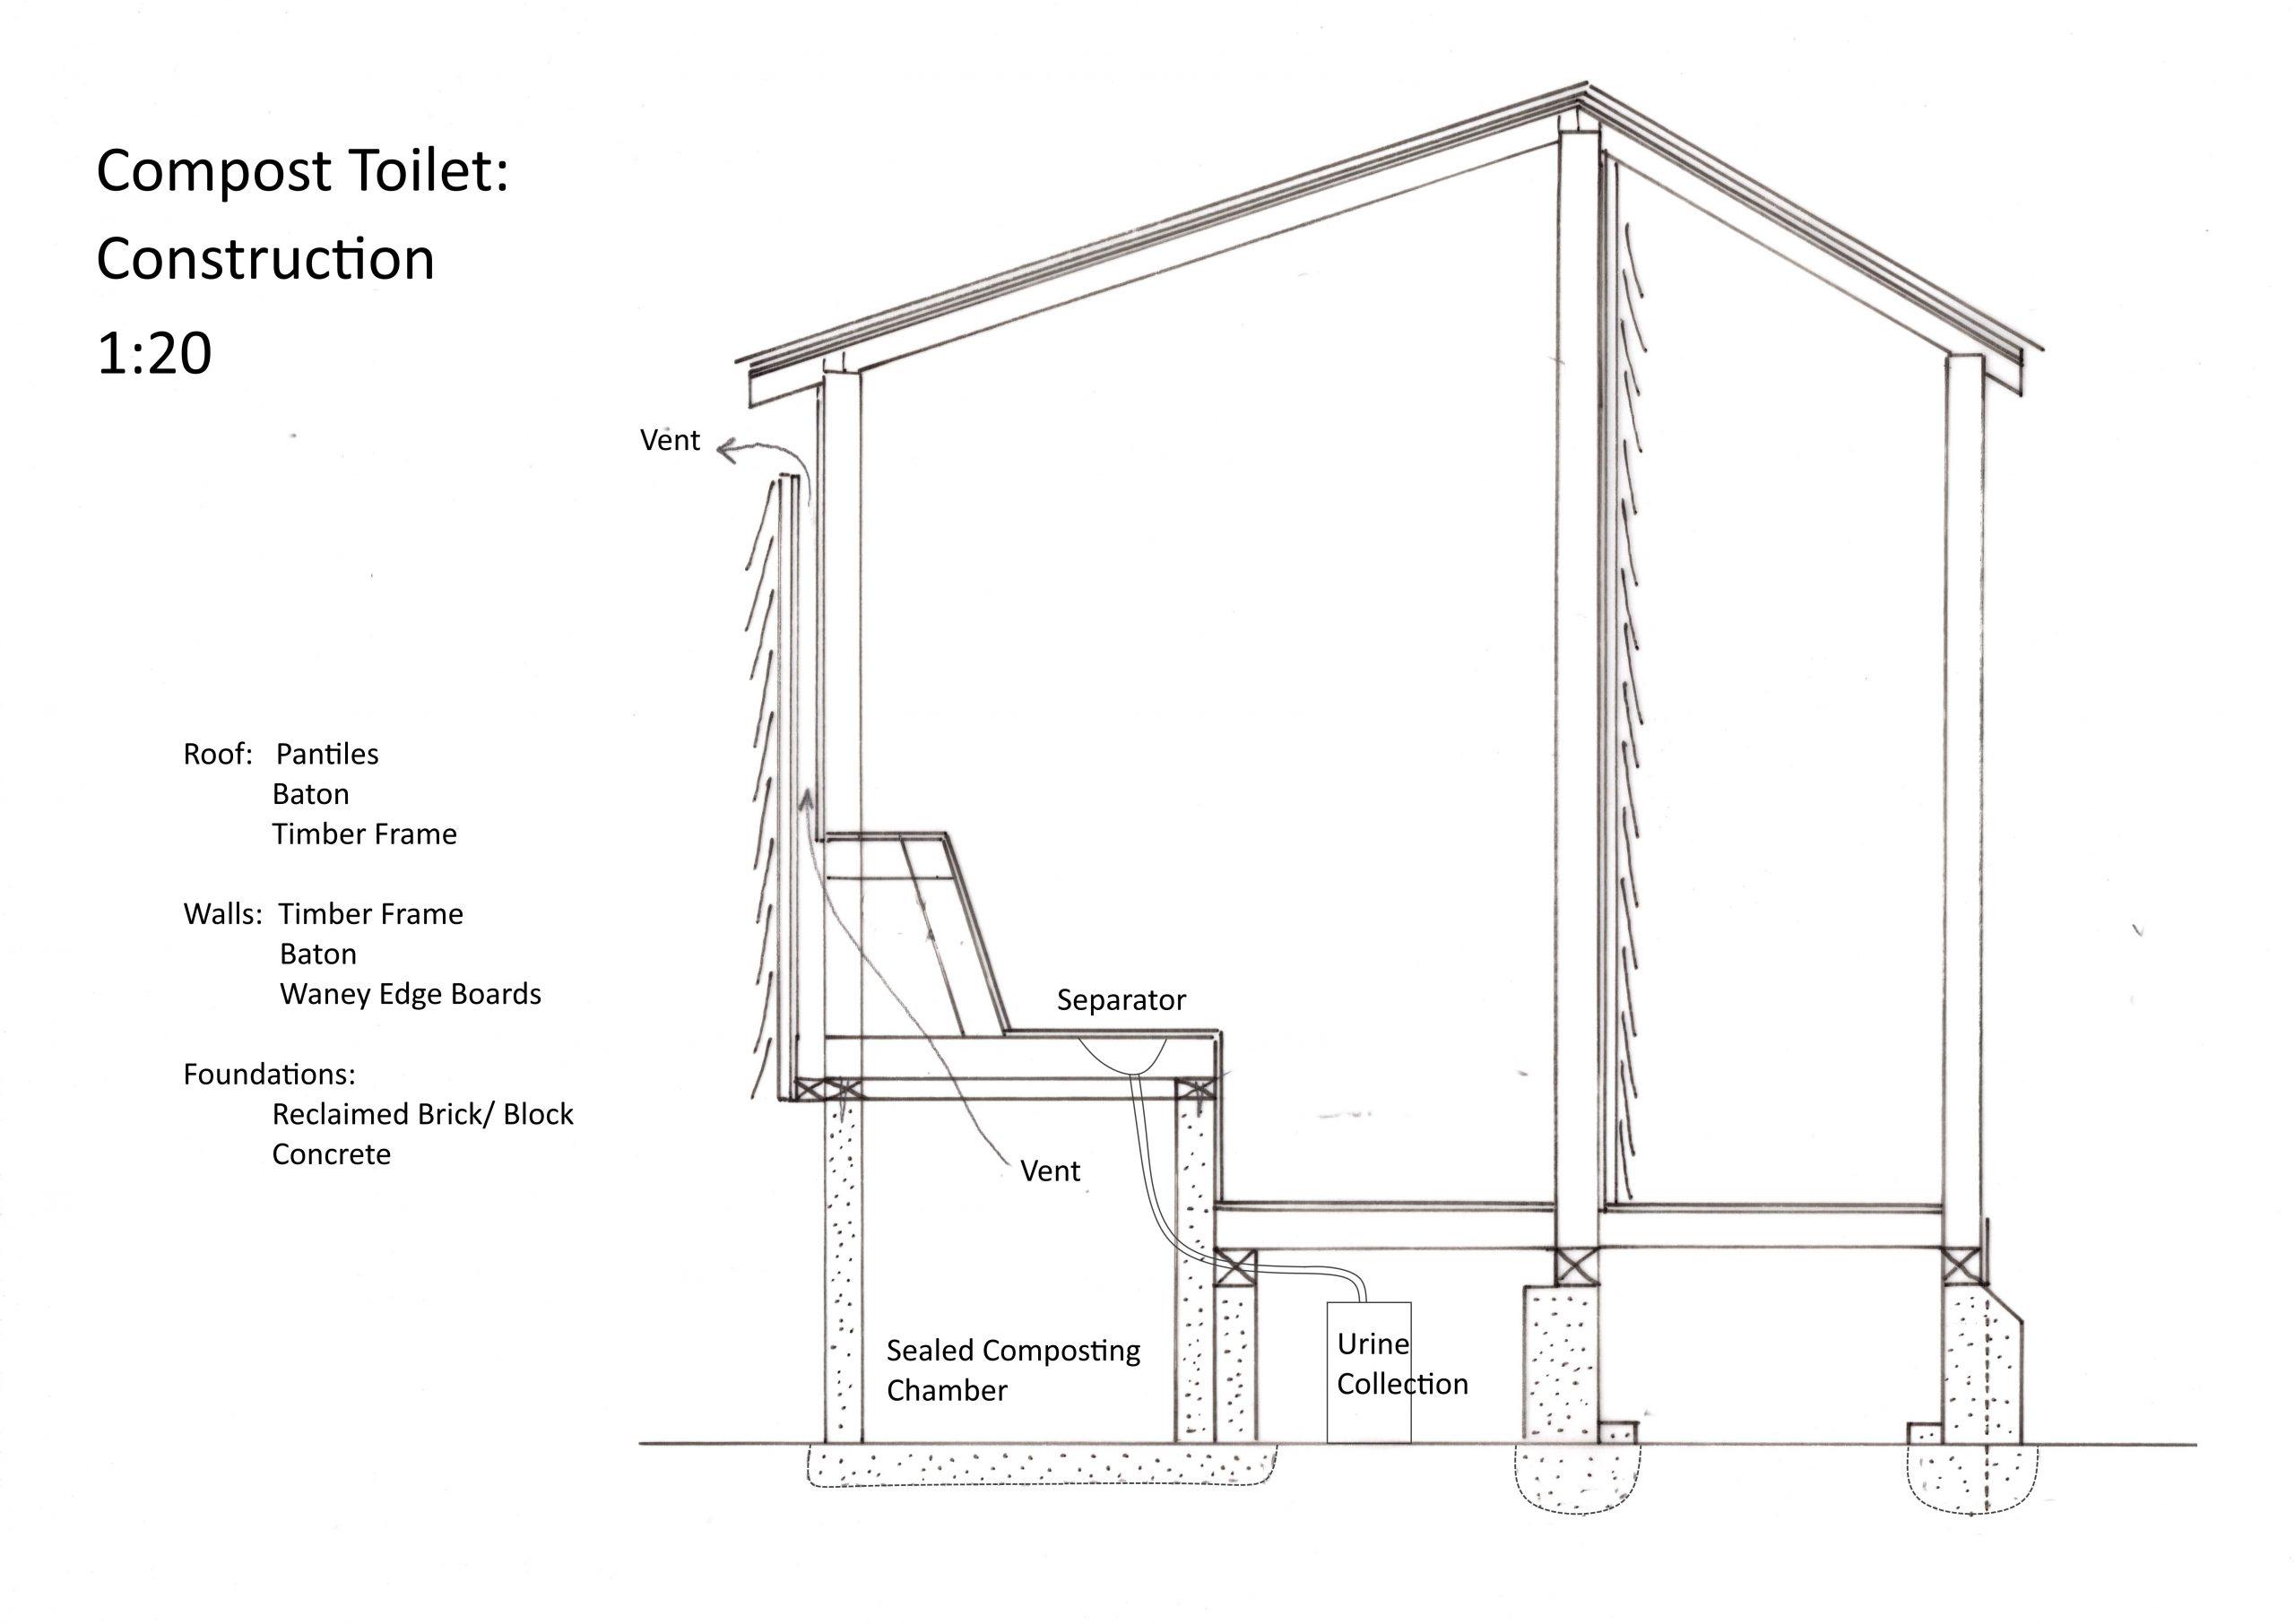 Compost Toilet const